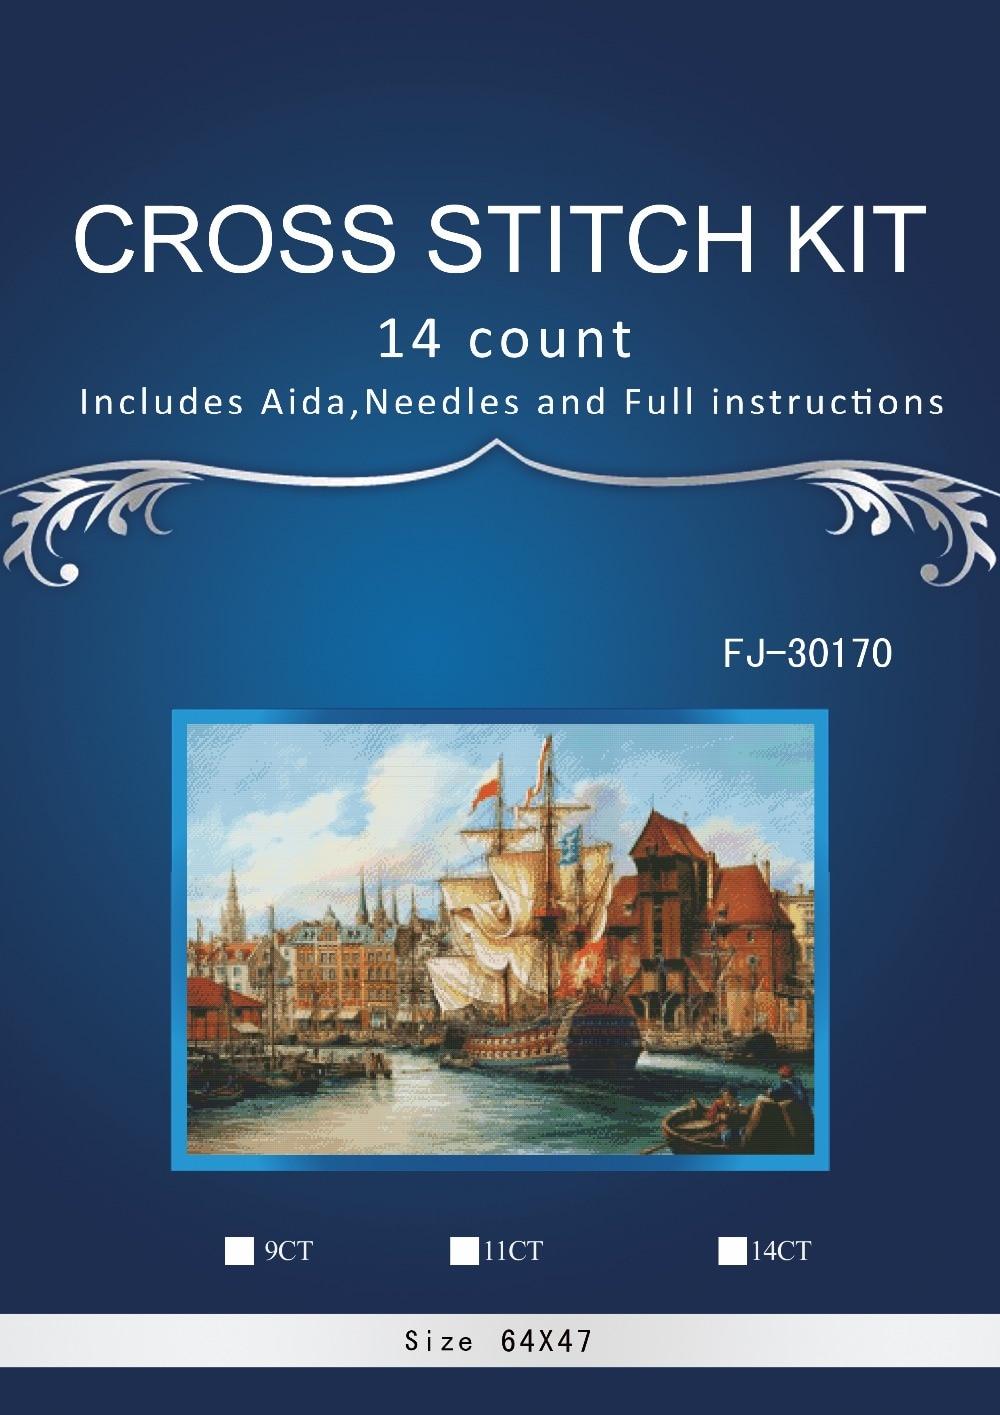 Top Quality Beautiful Lovely Counted Cross Stitch Kit sea corner with boat Similar DIM dmc cross stitch kit